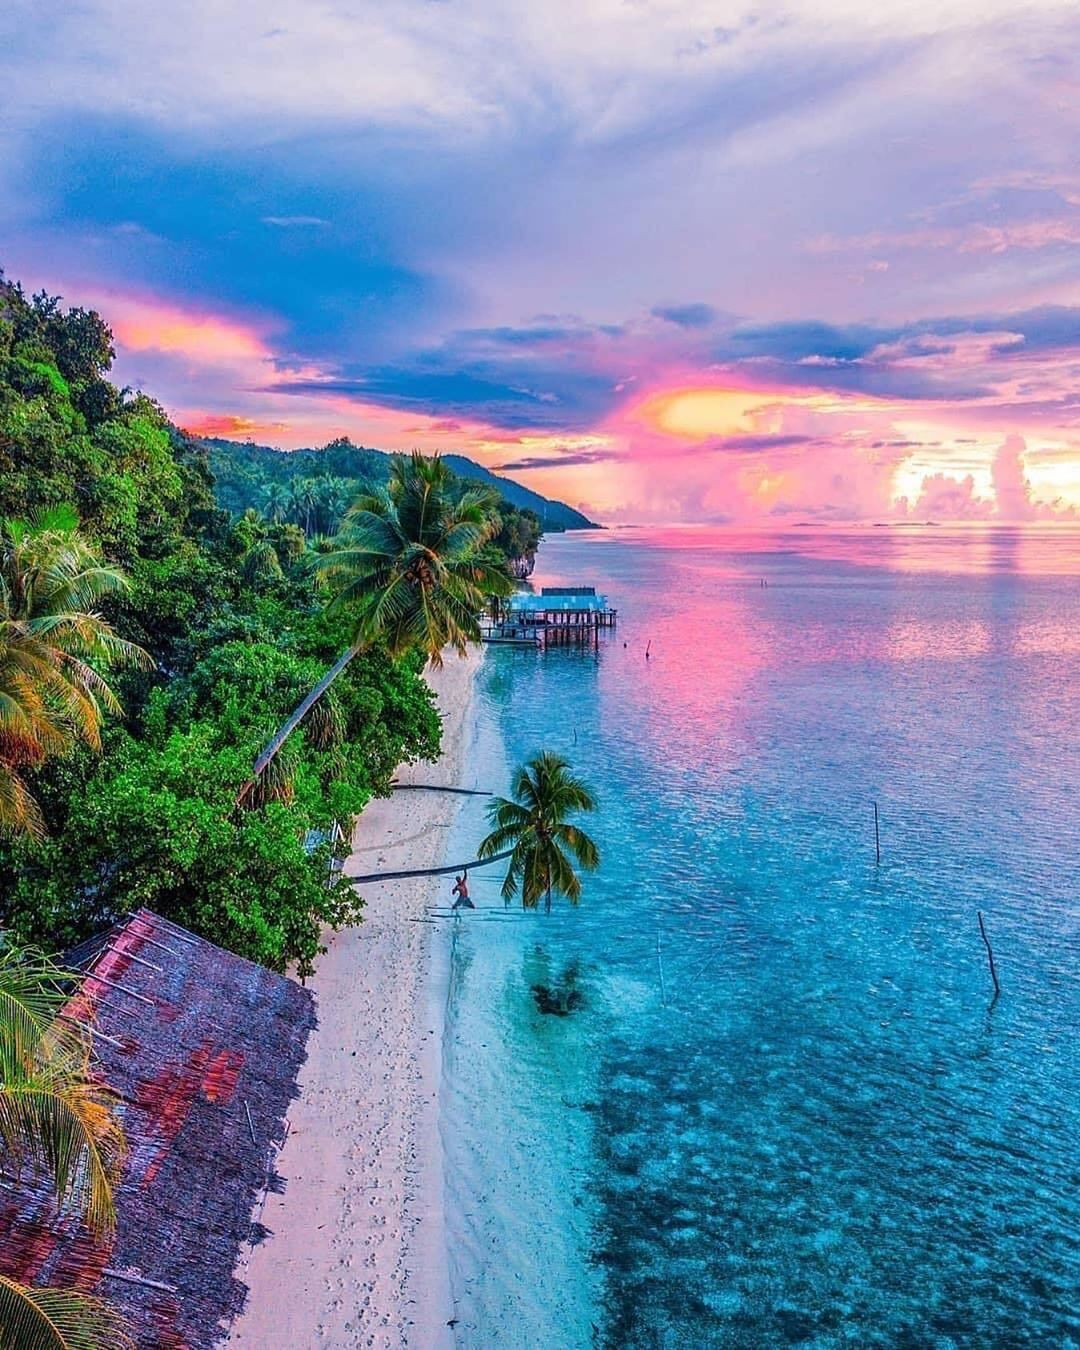 """Cotton Candy Paradise In Bali 🍭 🌅 By @rickardsvartgrund"